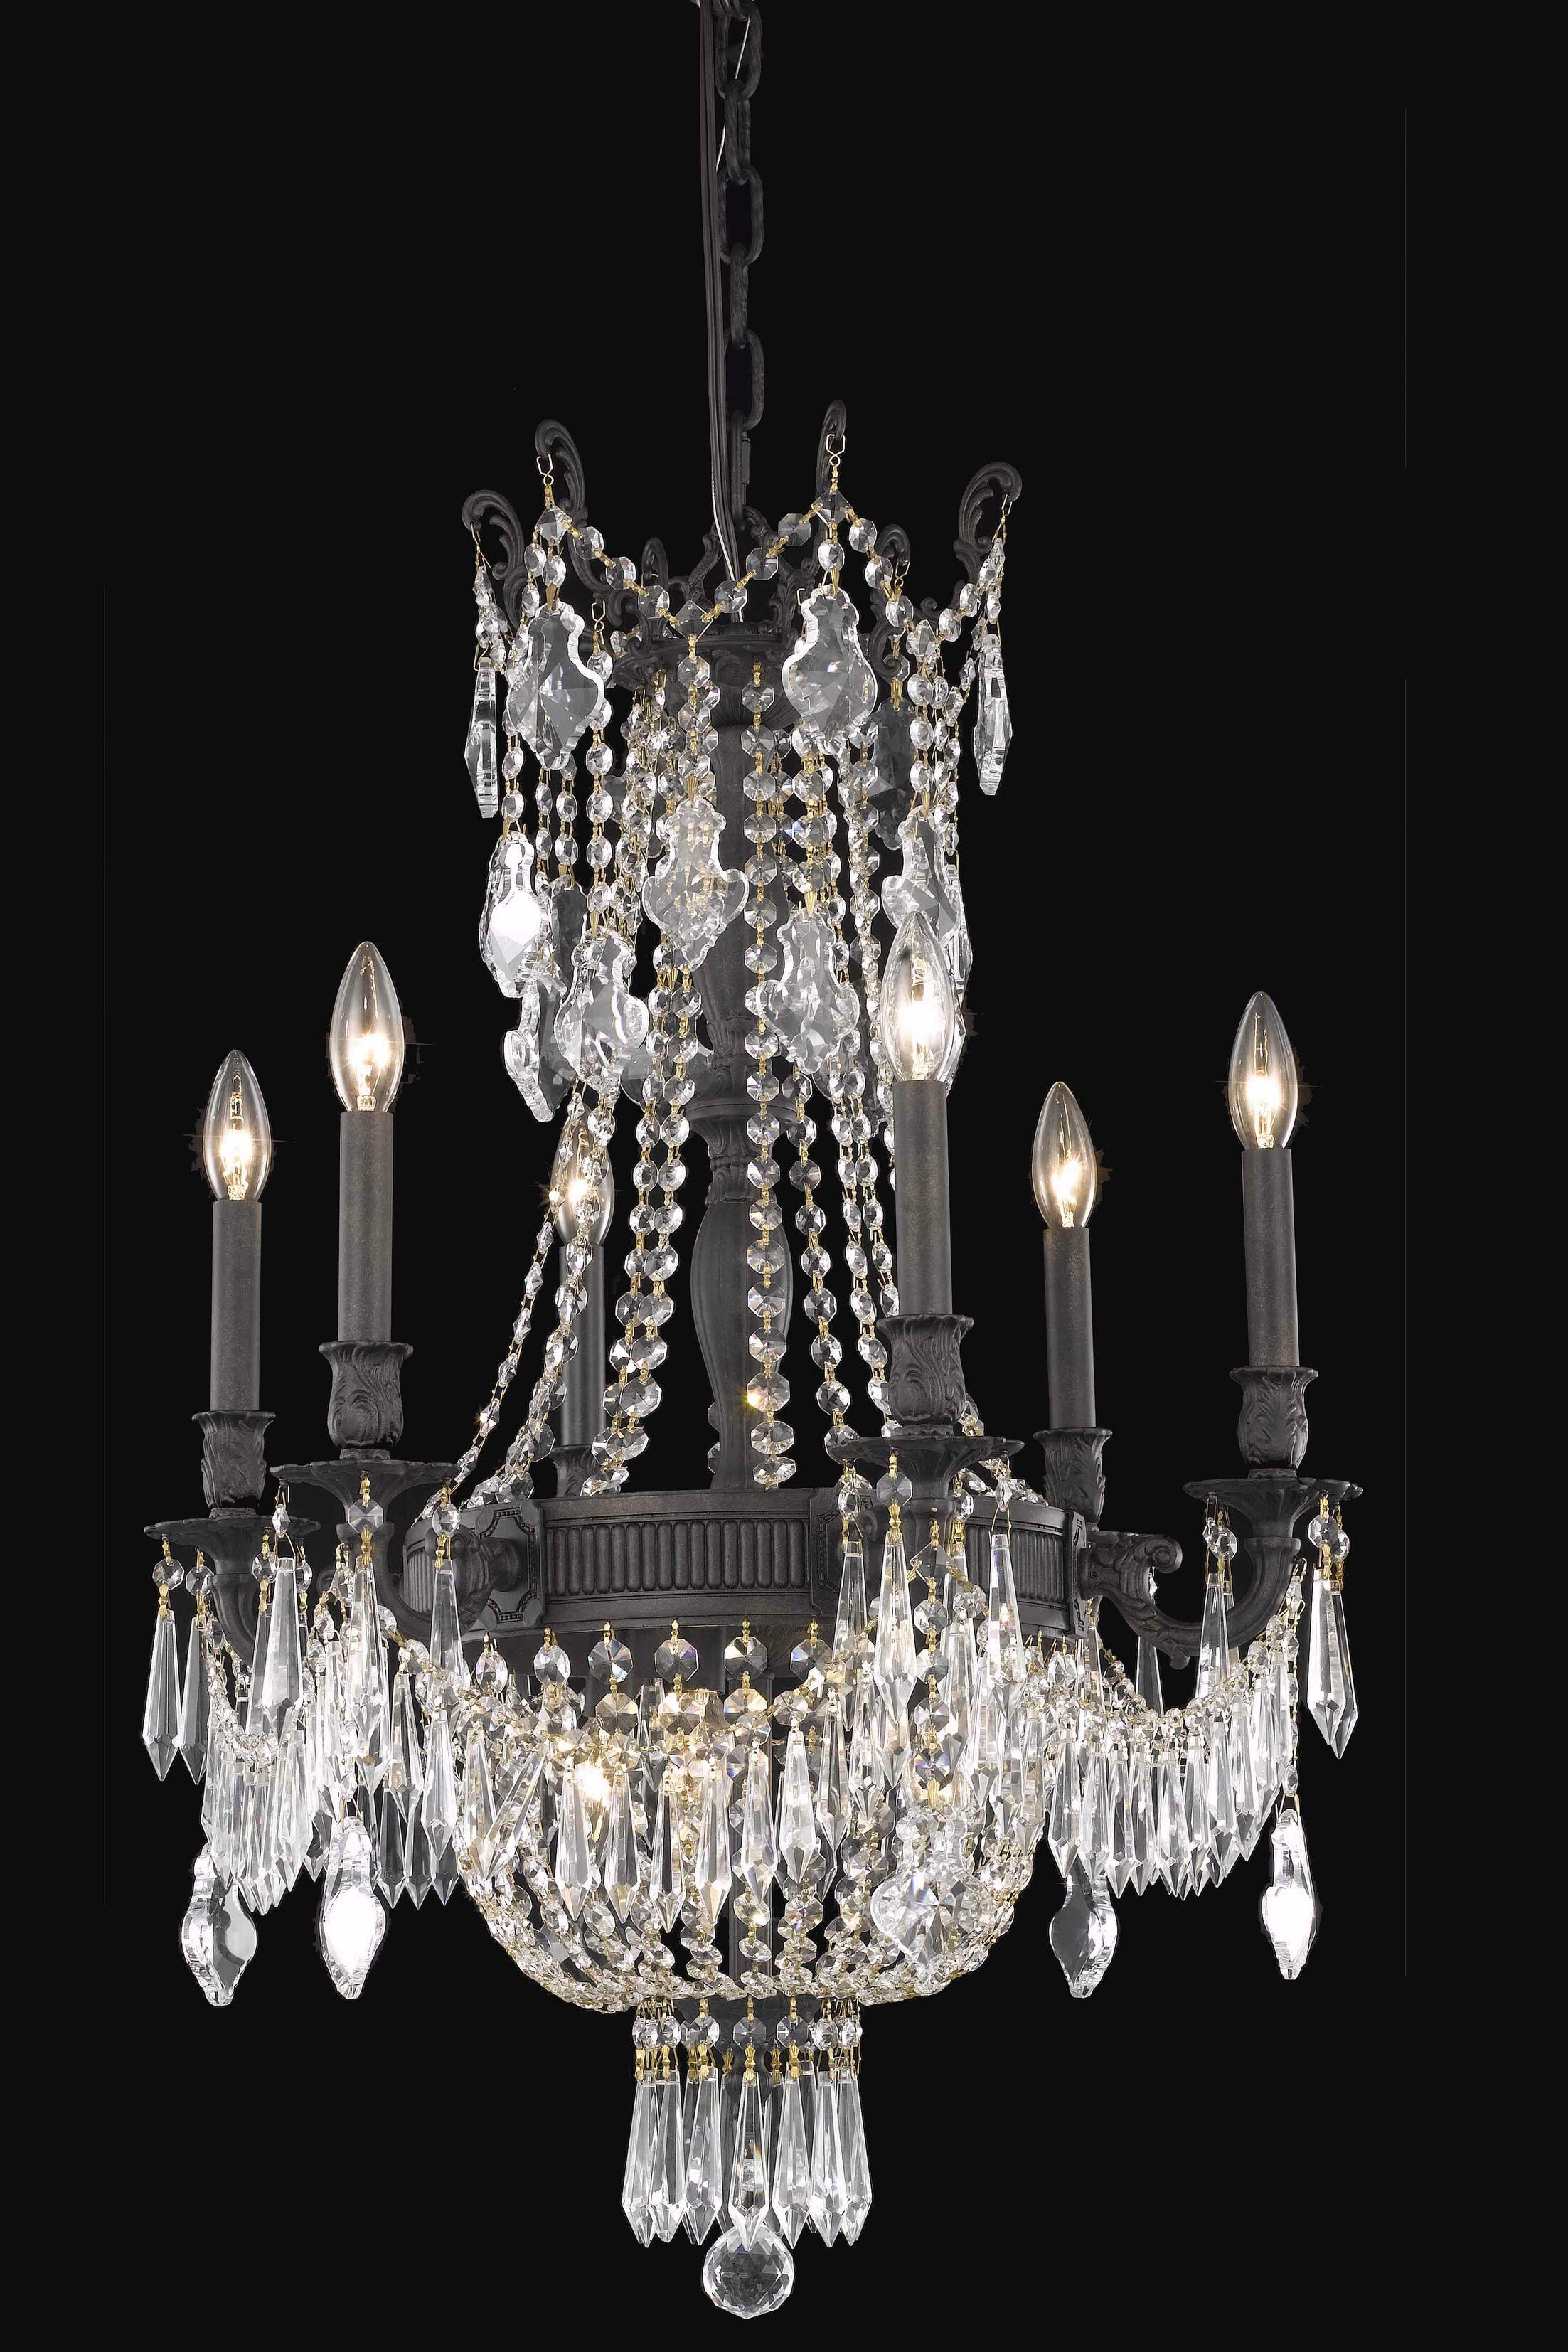 Ursula Traditional 9-Light Empire Chandelier Crystal Grade: Spectra Swarovski